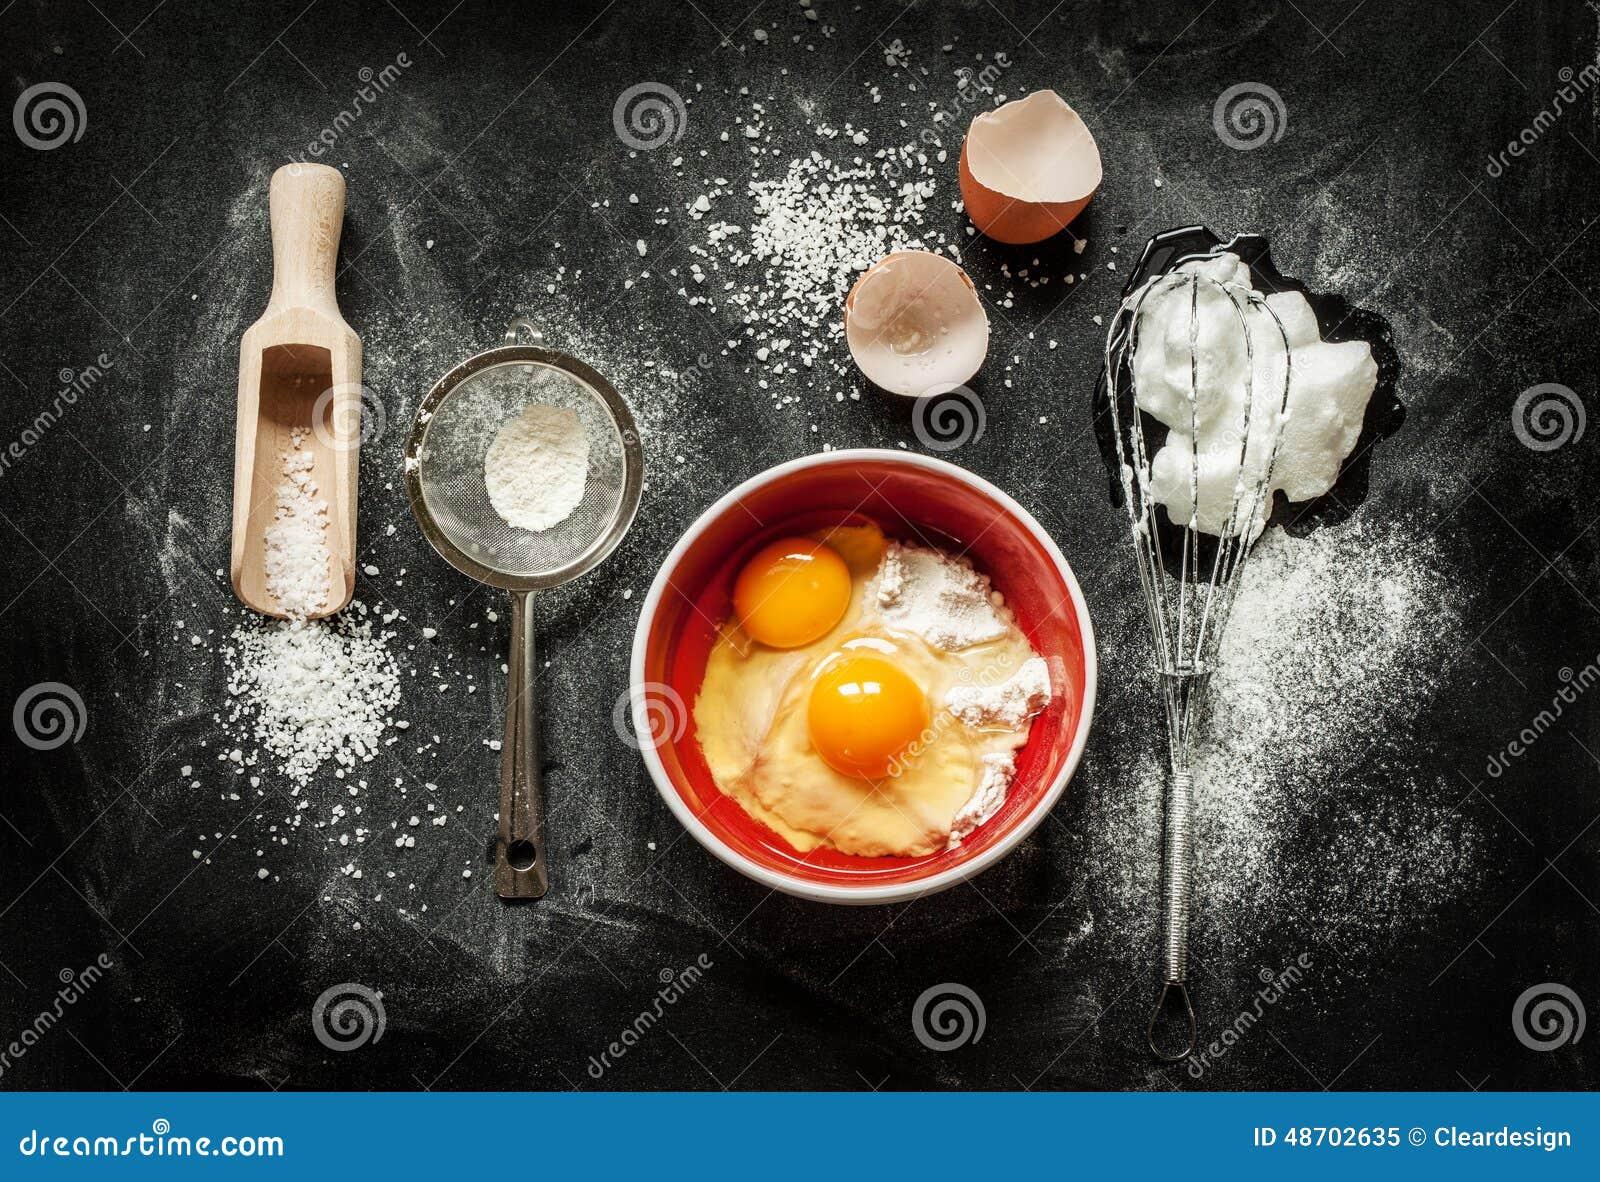 Foam Cake Ingredients